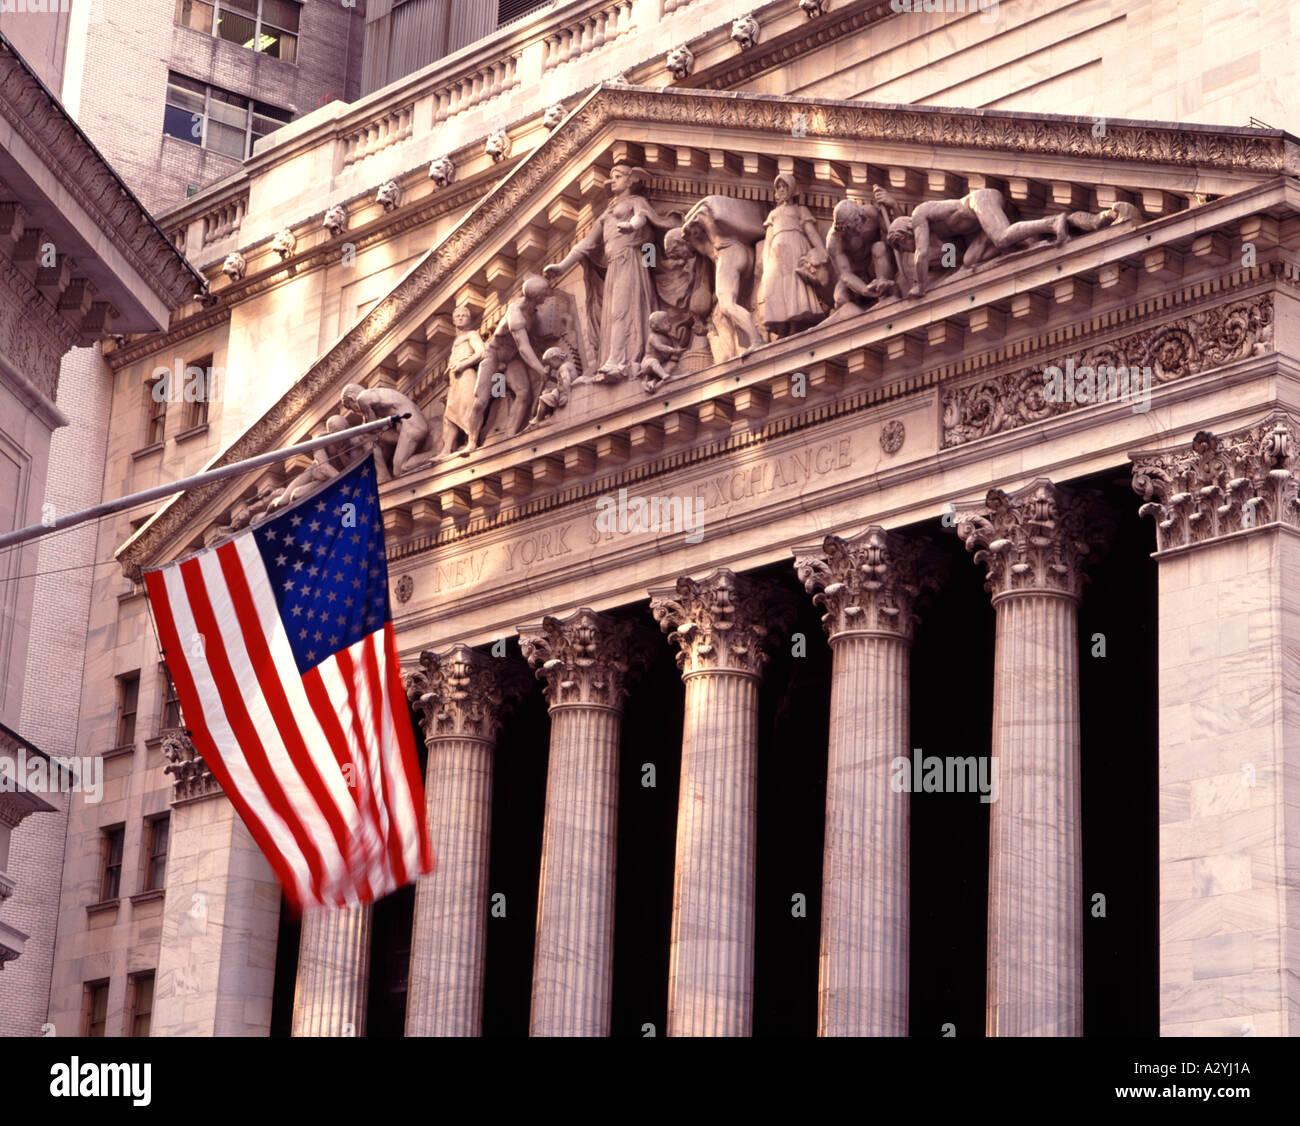 New York Stock Exchange, Wall Street, New York, USA - Stock Image